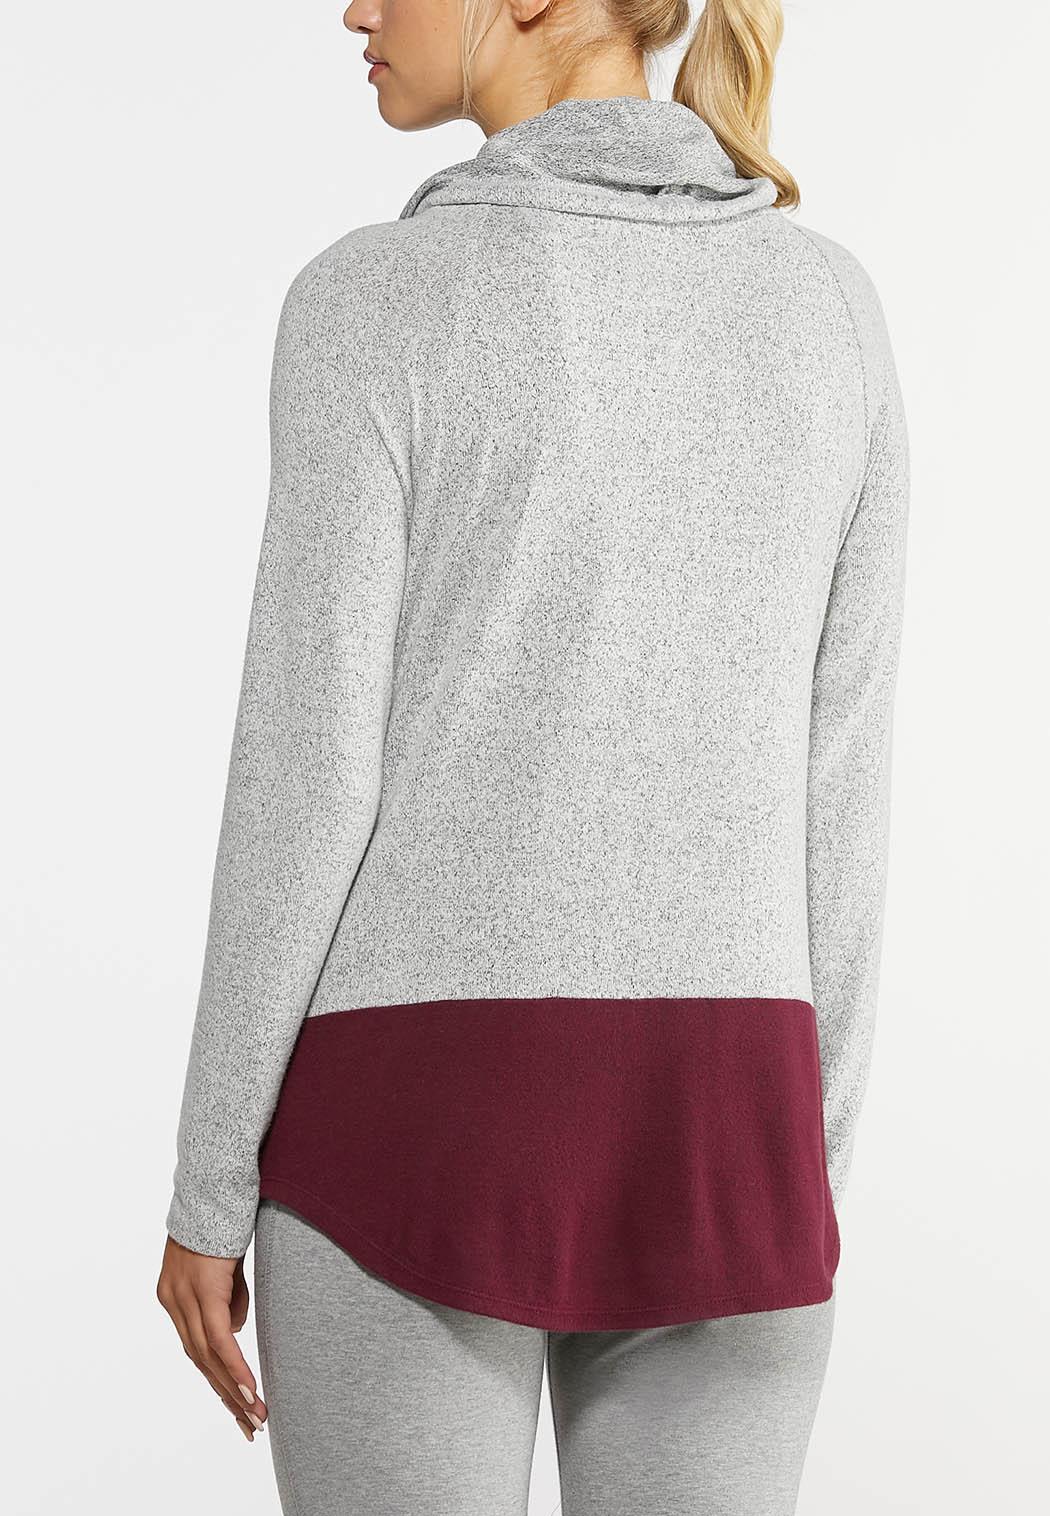 Colorblock Cowl Neck Top (Item #43964171)